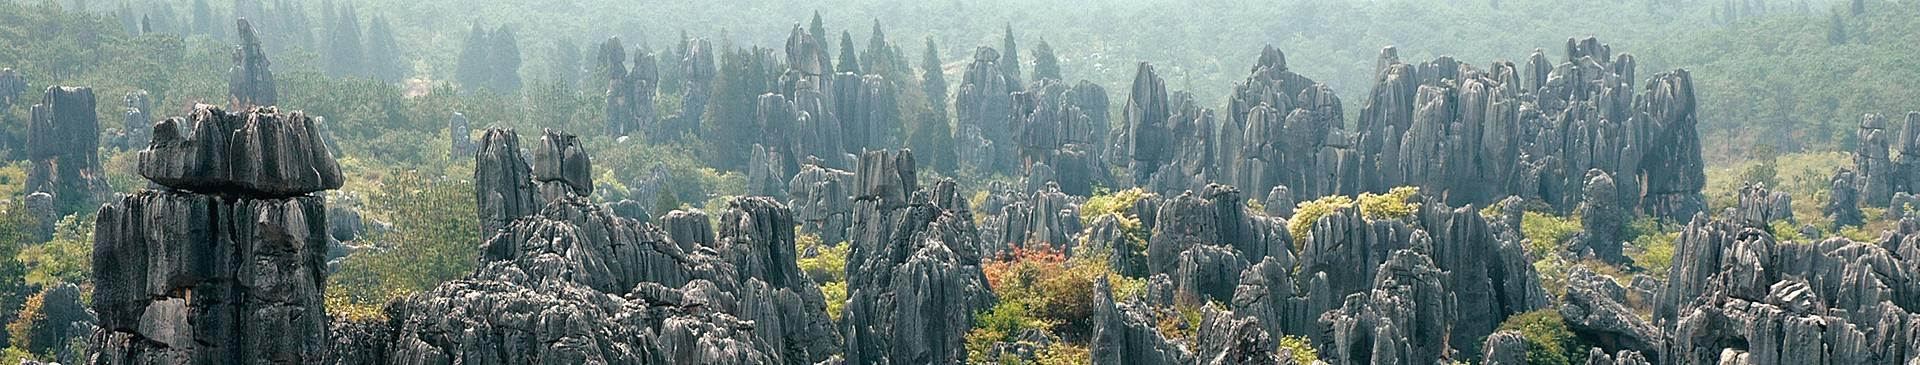 Natuurreis in China